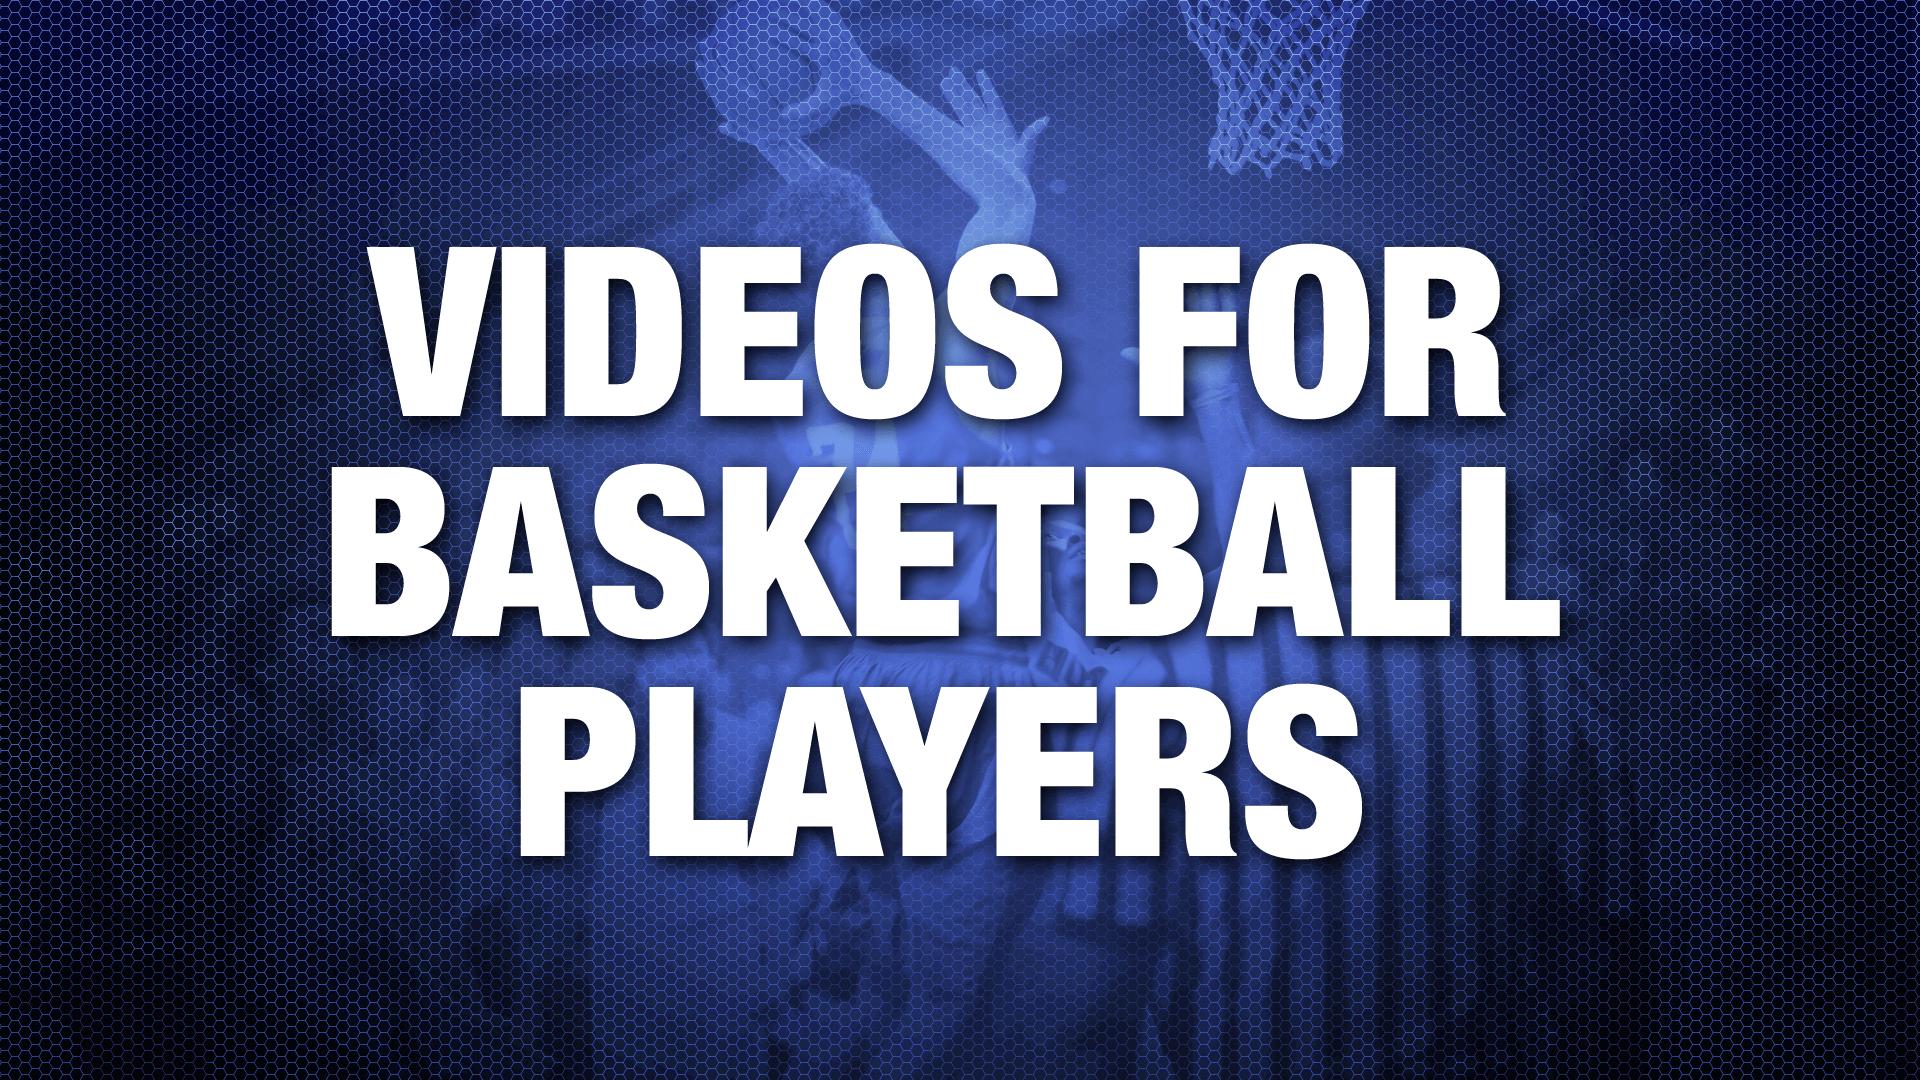 VideosForBasketballPlayers